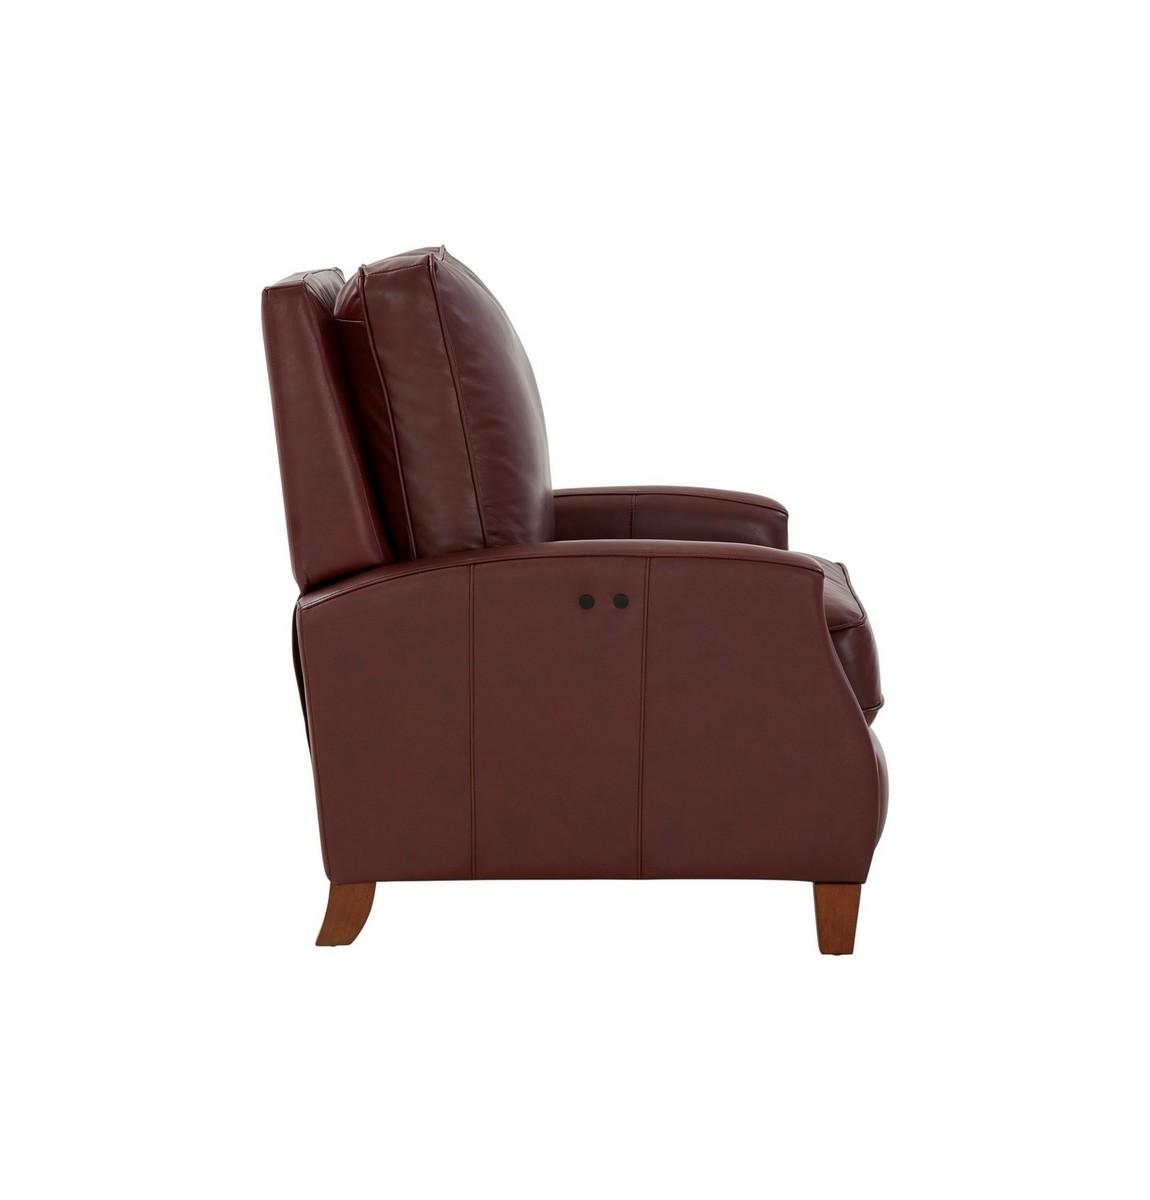 Barcalounger Penrose Power Recliner Chair - Shoreham Wine/All Leather